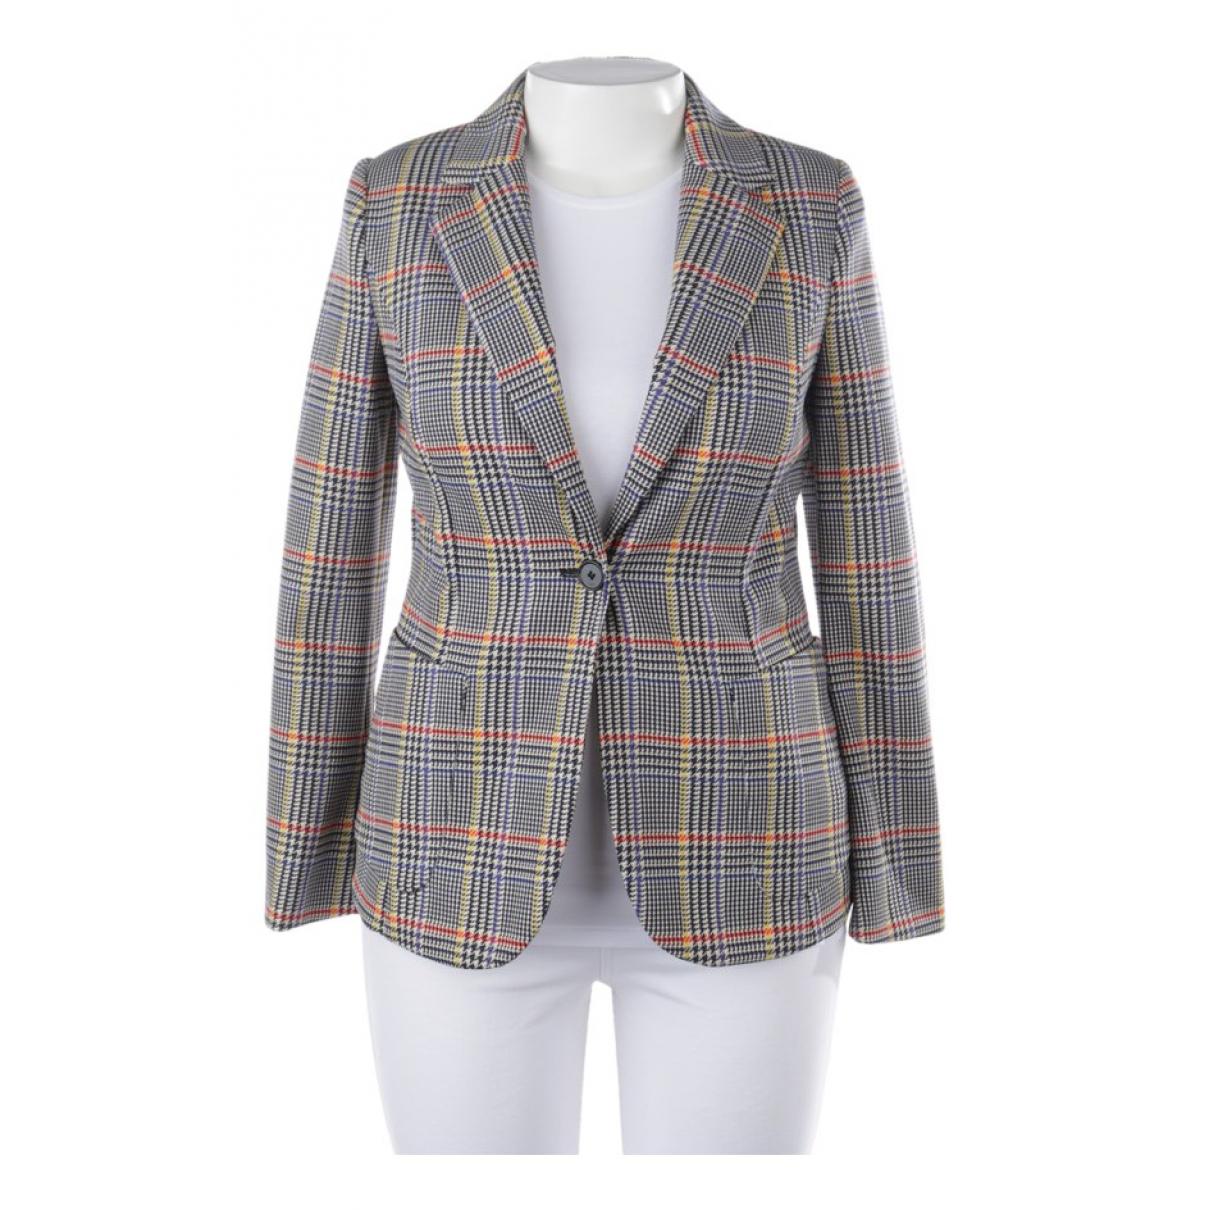 Marc Cain \N Multicolour jacket for Women 40 FR